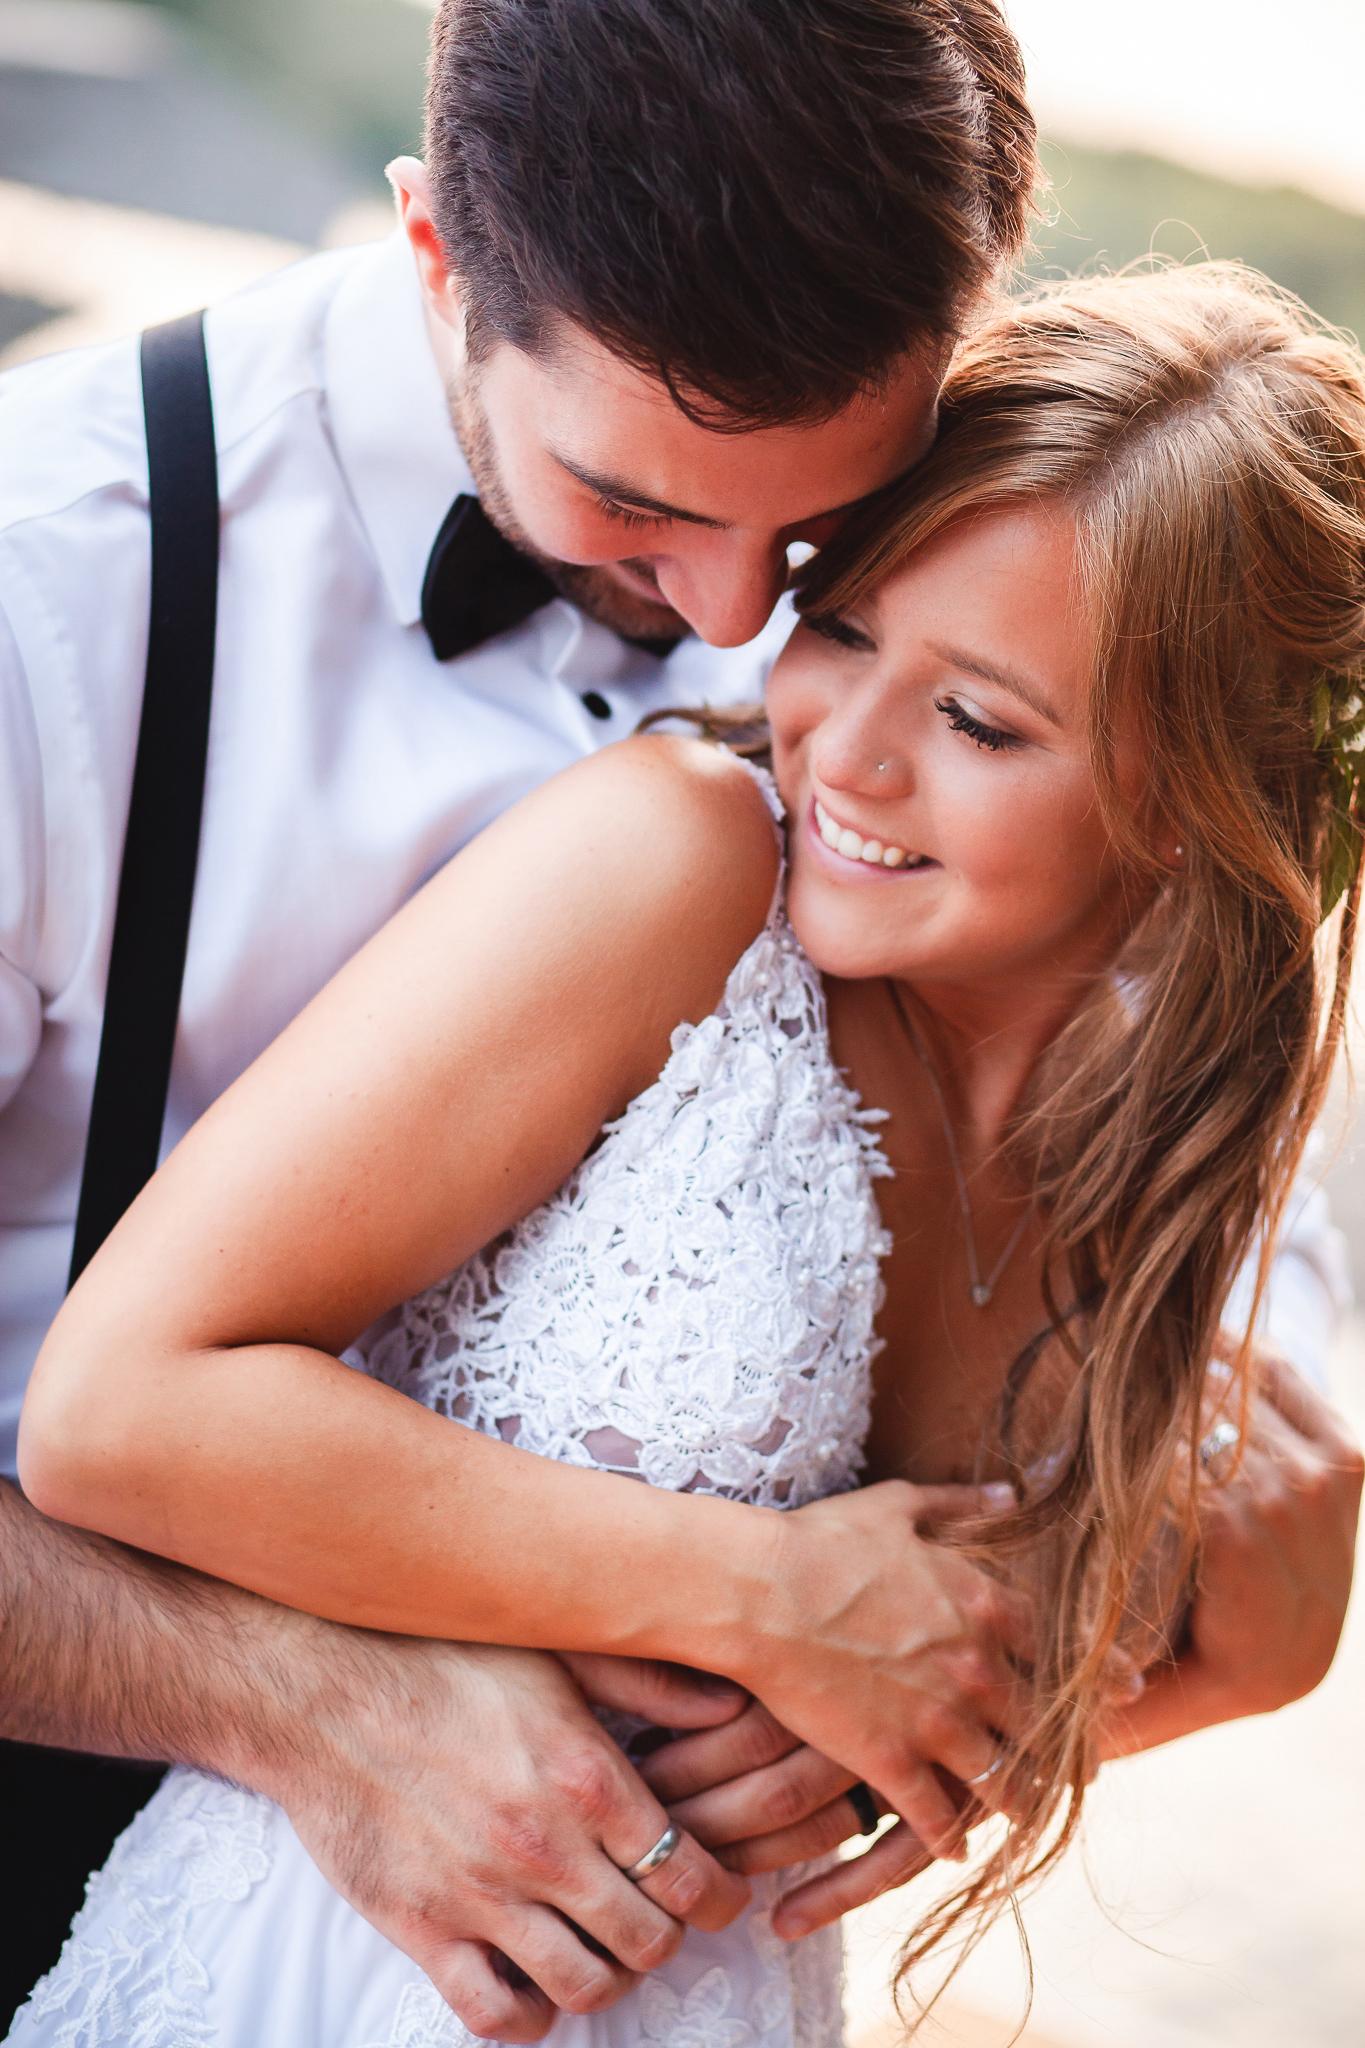 Amy+D+Photography-+Bride+and+Groom-+Wedding+Poses-+Muskoka+Wedding-+Barrie+Wedding+Photographer-+Best+Wedding+Photographer-+Muskoka+Wedding+Photography-+Bride+Pose-+Groom+Pose-89.jpg